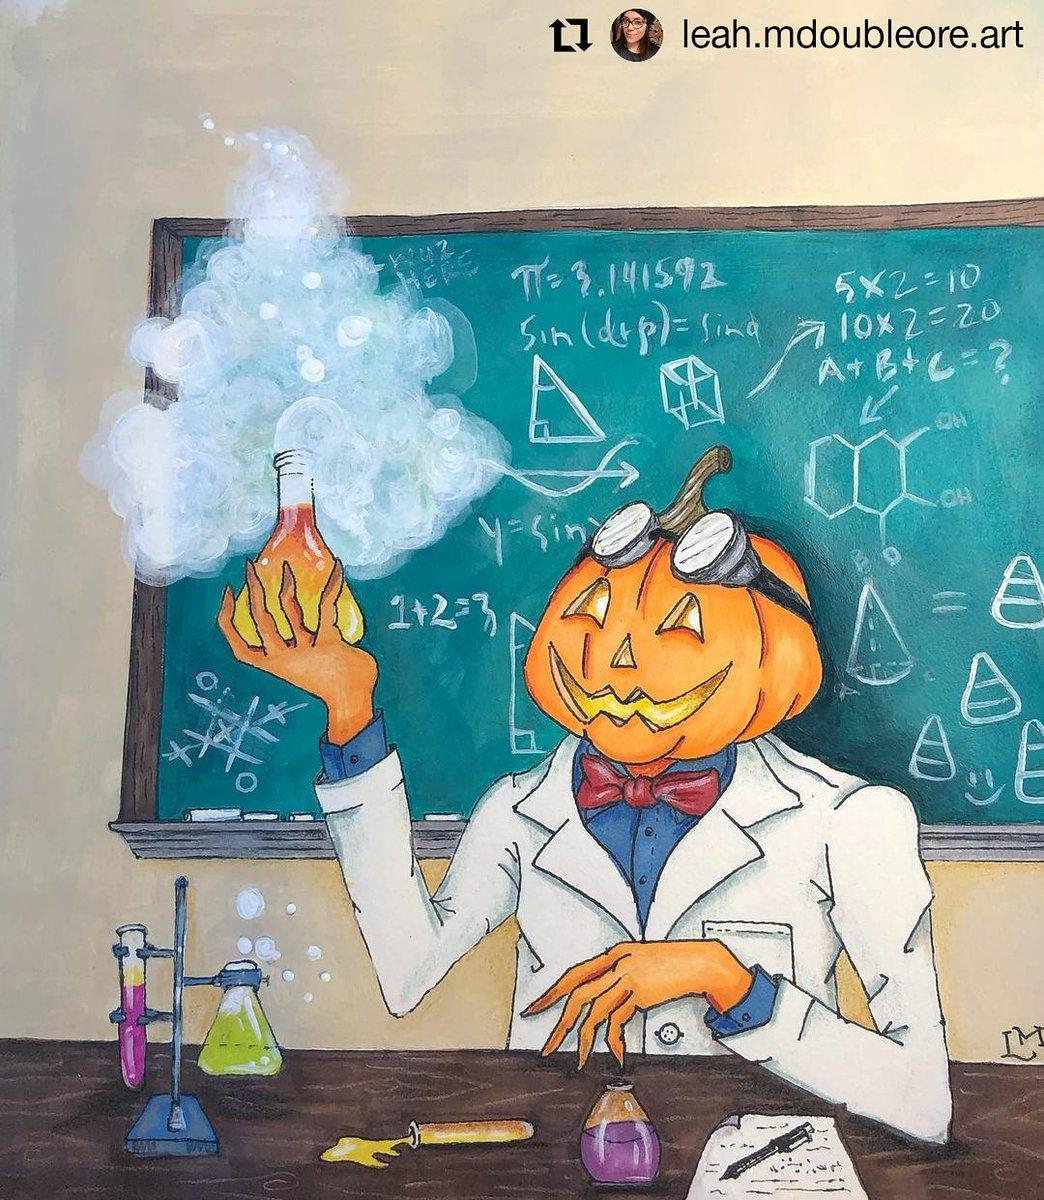 #Repost @leah.mdoubleore.art • • • • • • Drawlloween prompt: The Brilliant Professor Pumpkin. •  @drawlloween  #drawlloween2020  #drawlloween  #thebrilliantprofessorpumpkin  #illustration  #halloweenart #halloweenartwork